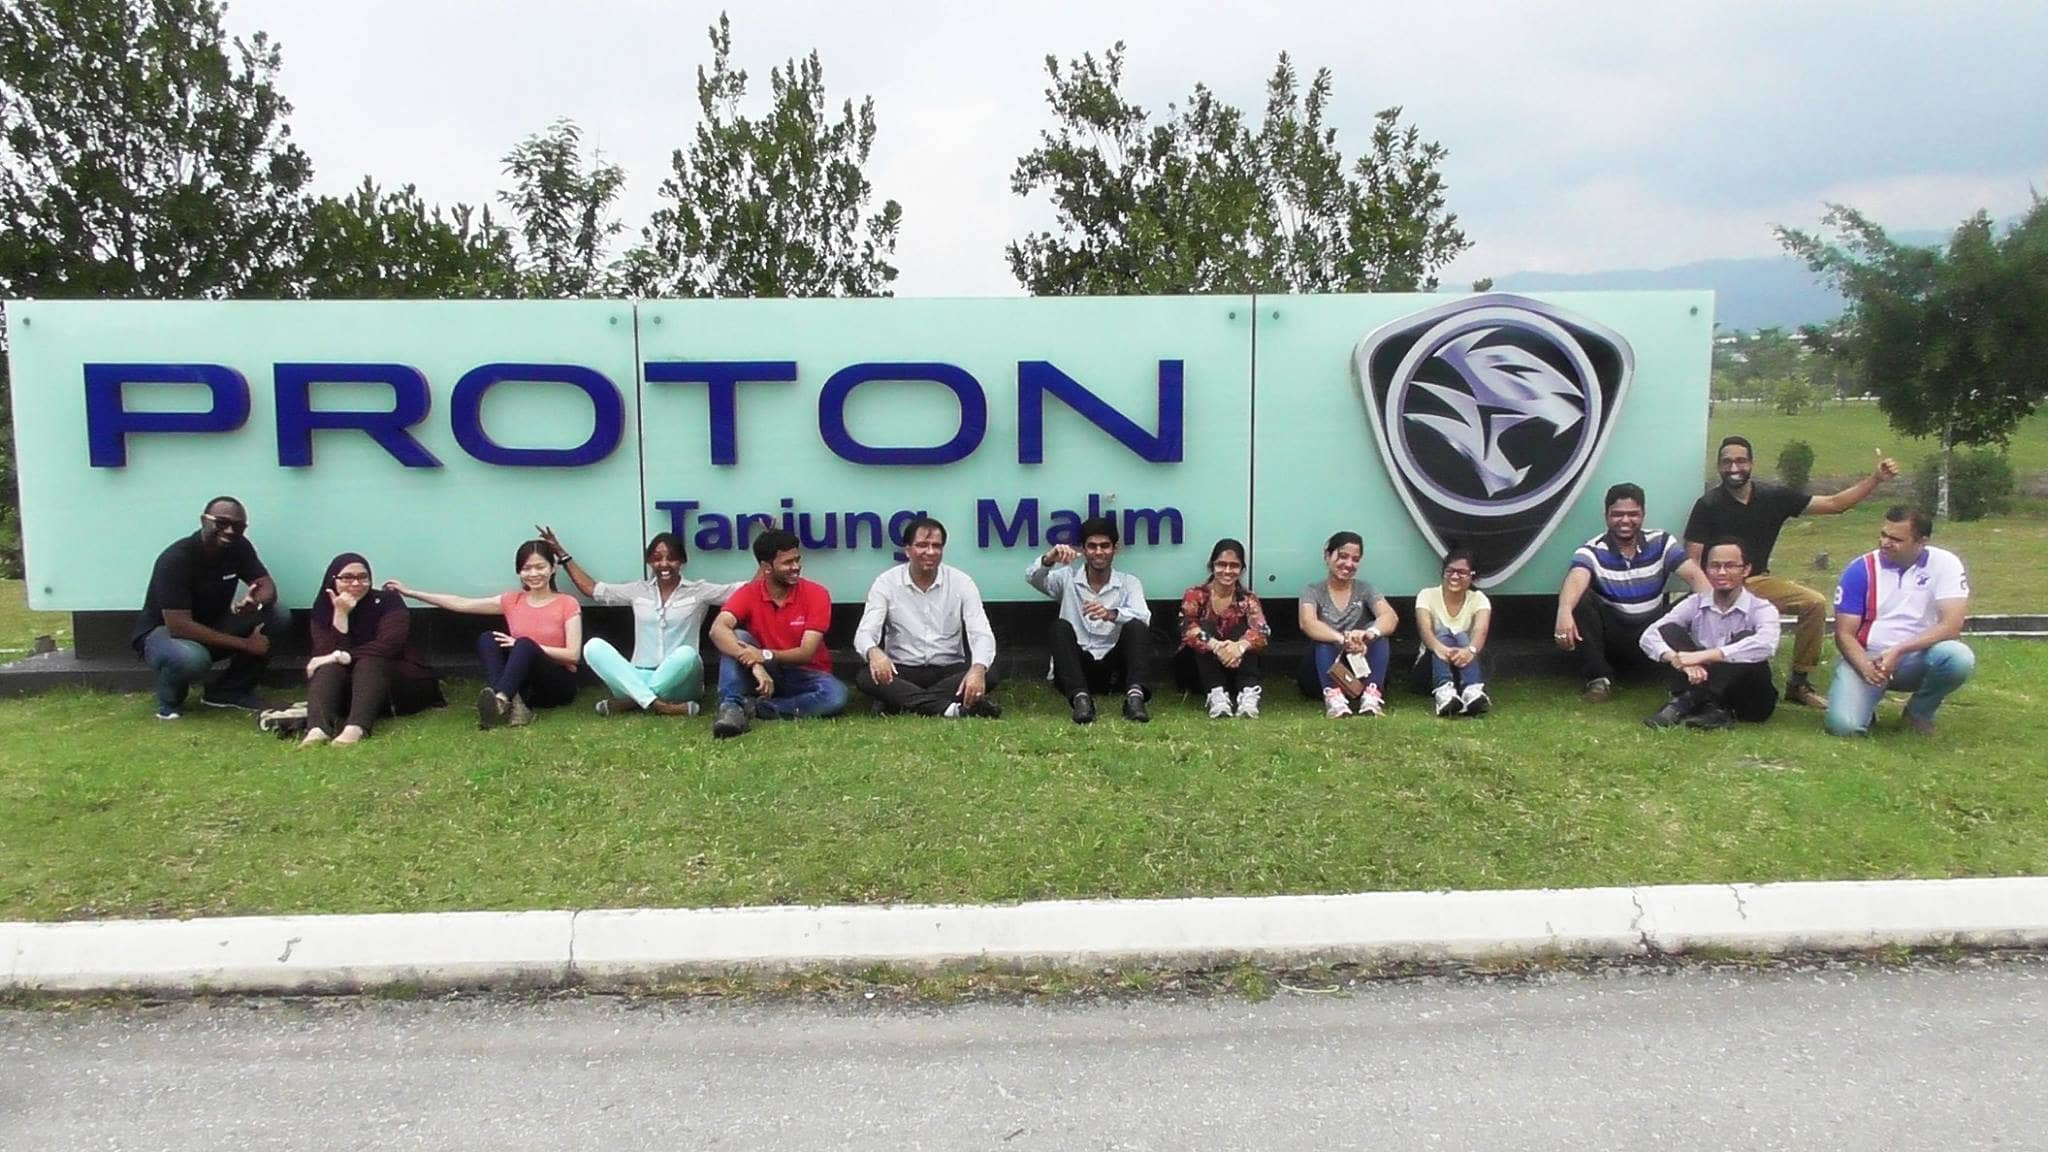 MSCM Class of 2017 Visits Proton